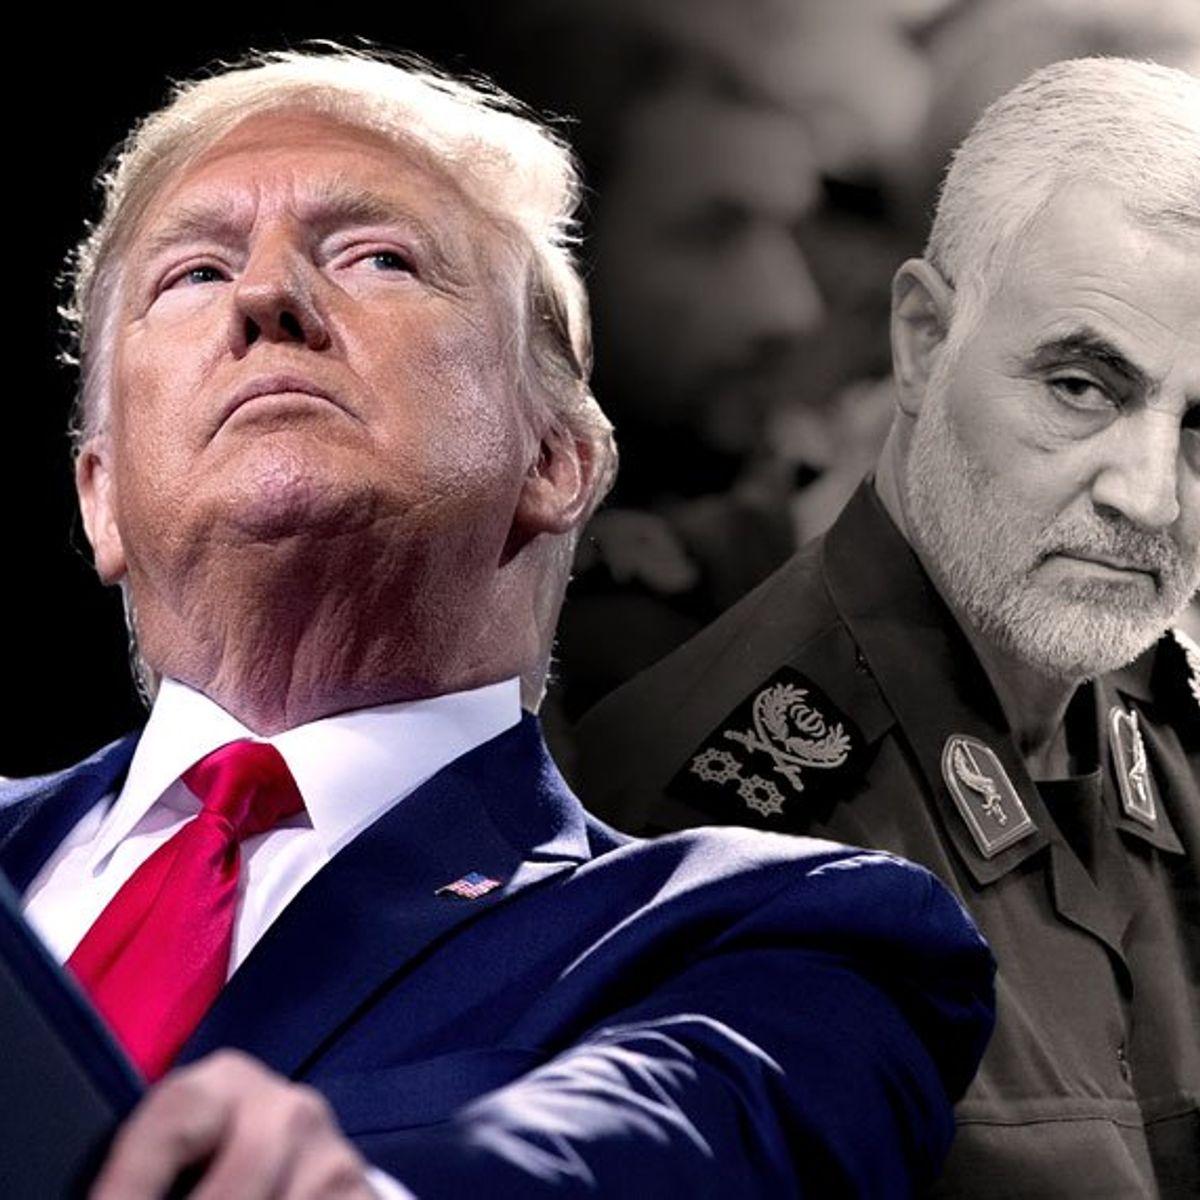 Emiten orden de arresto contra Donald Trump por asesinato de Qassem Soleimani